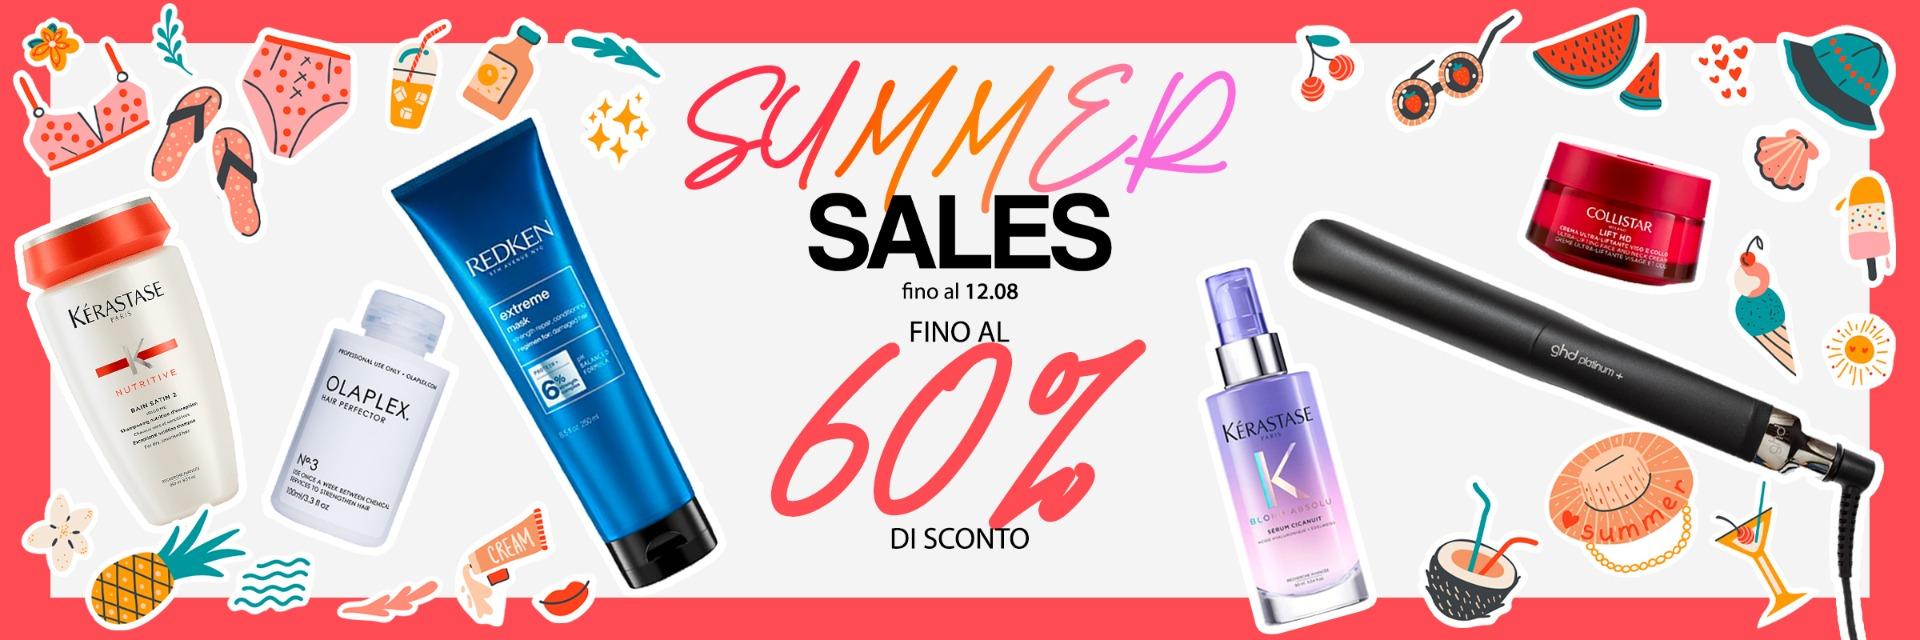 TRILAB Summer Sale 2021